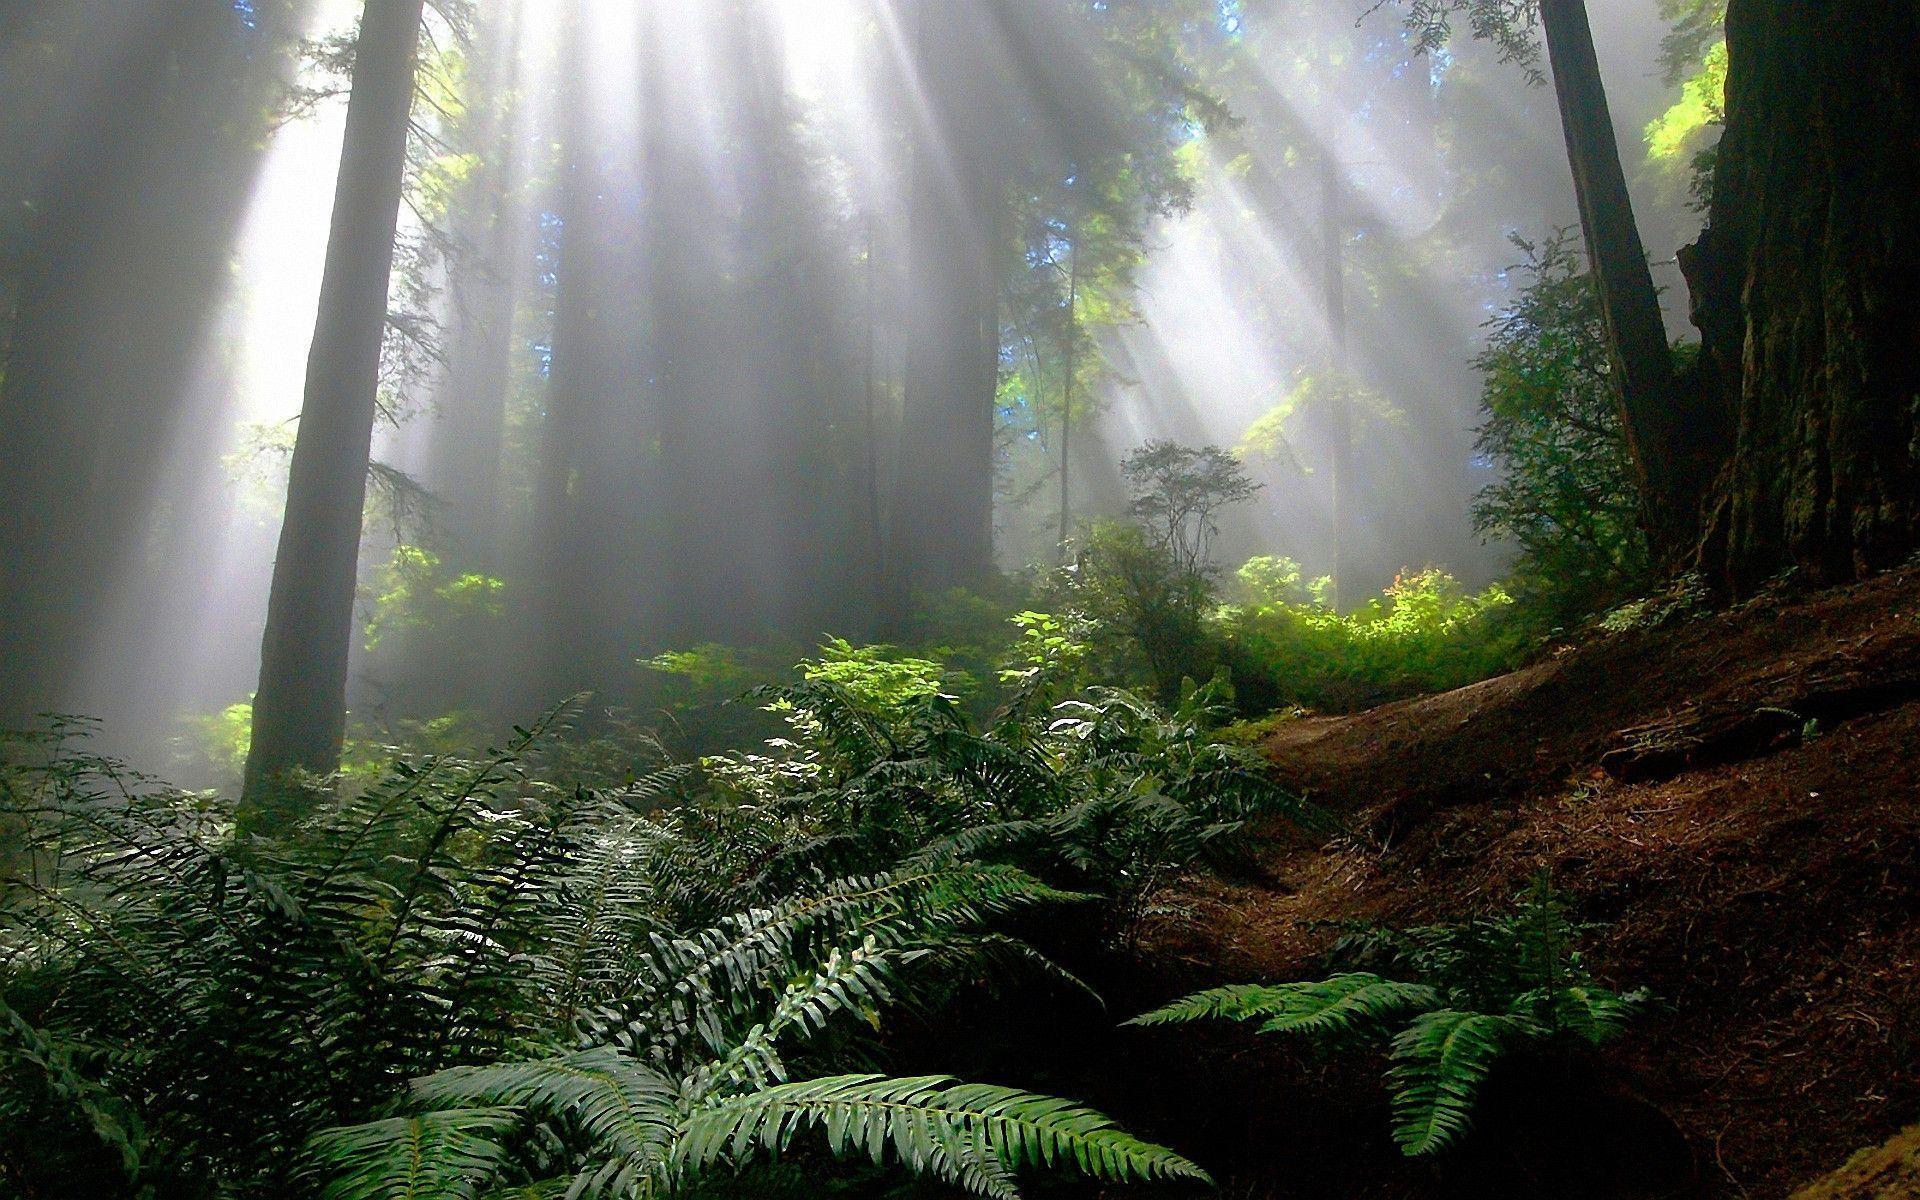 enchanted forest background - photo #4